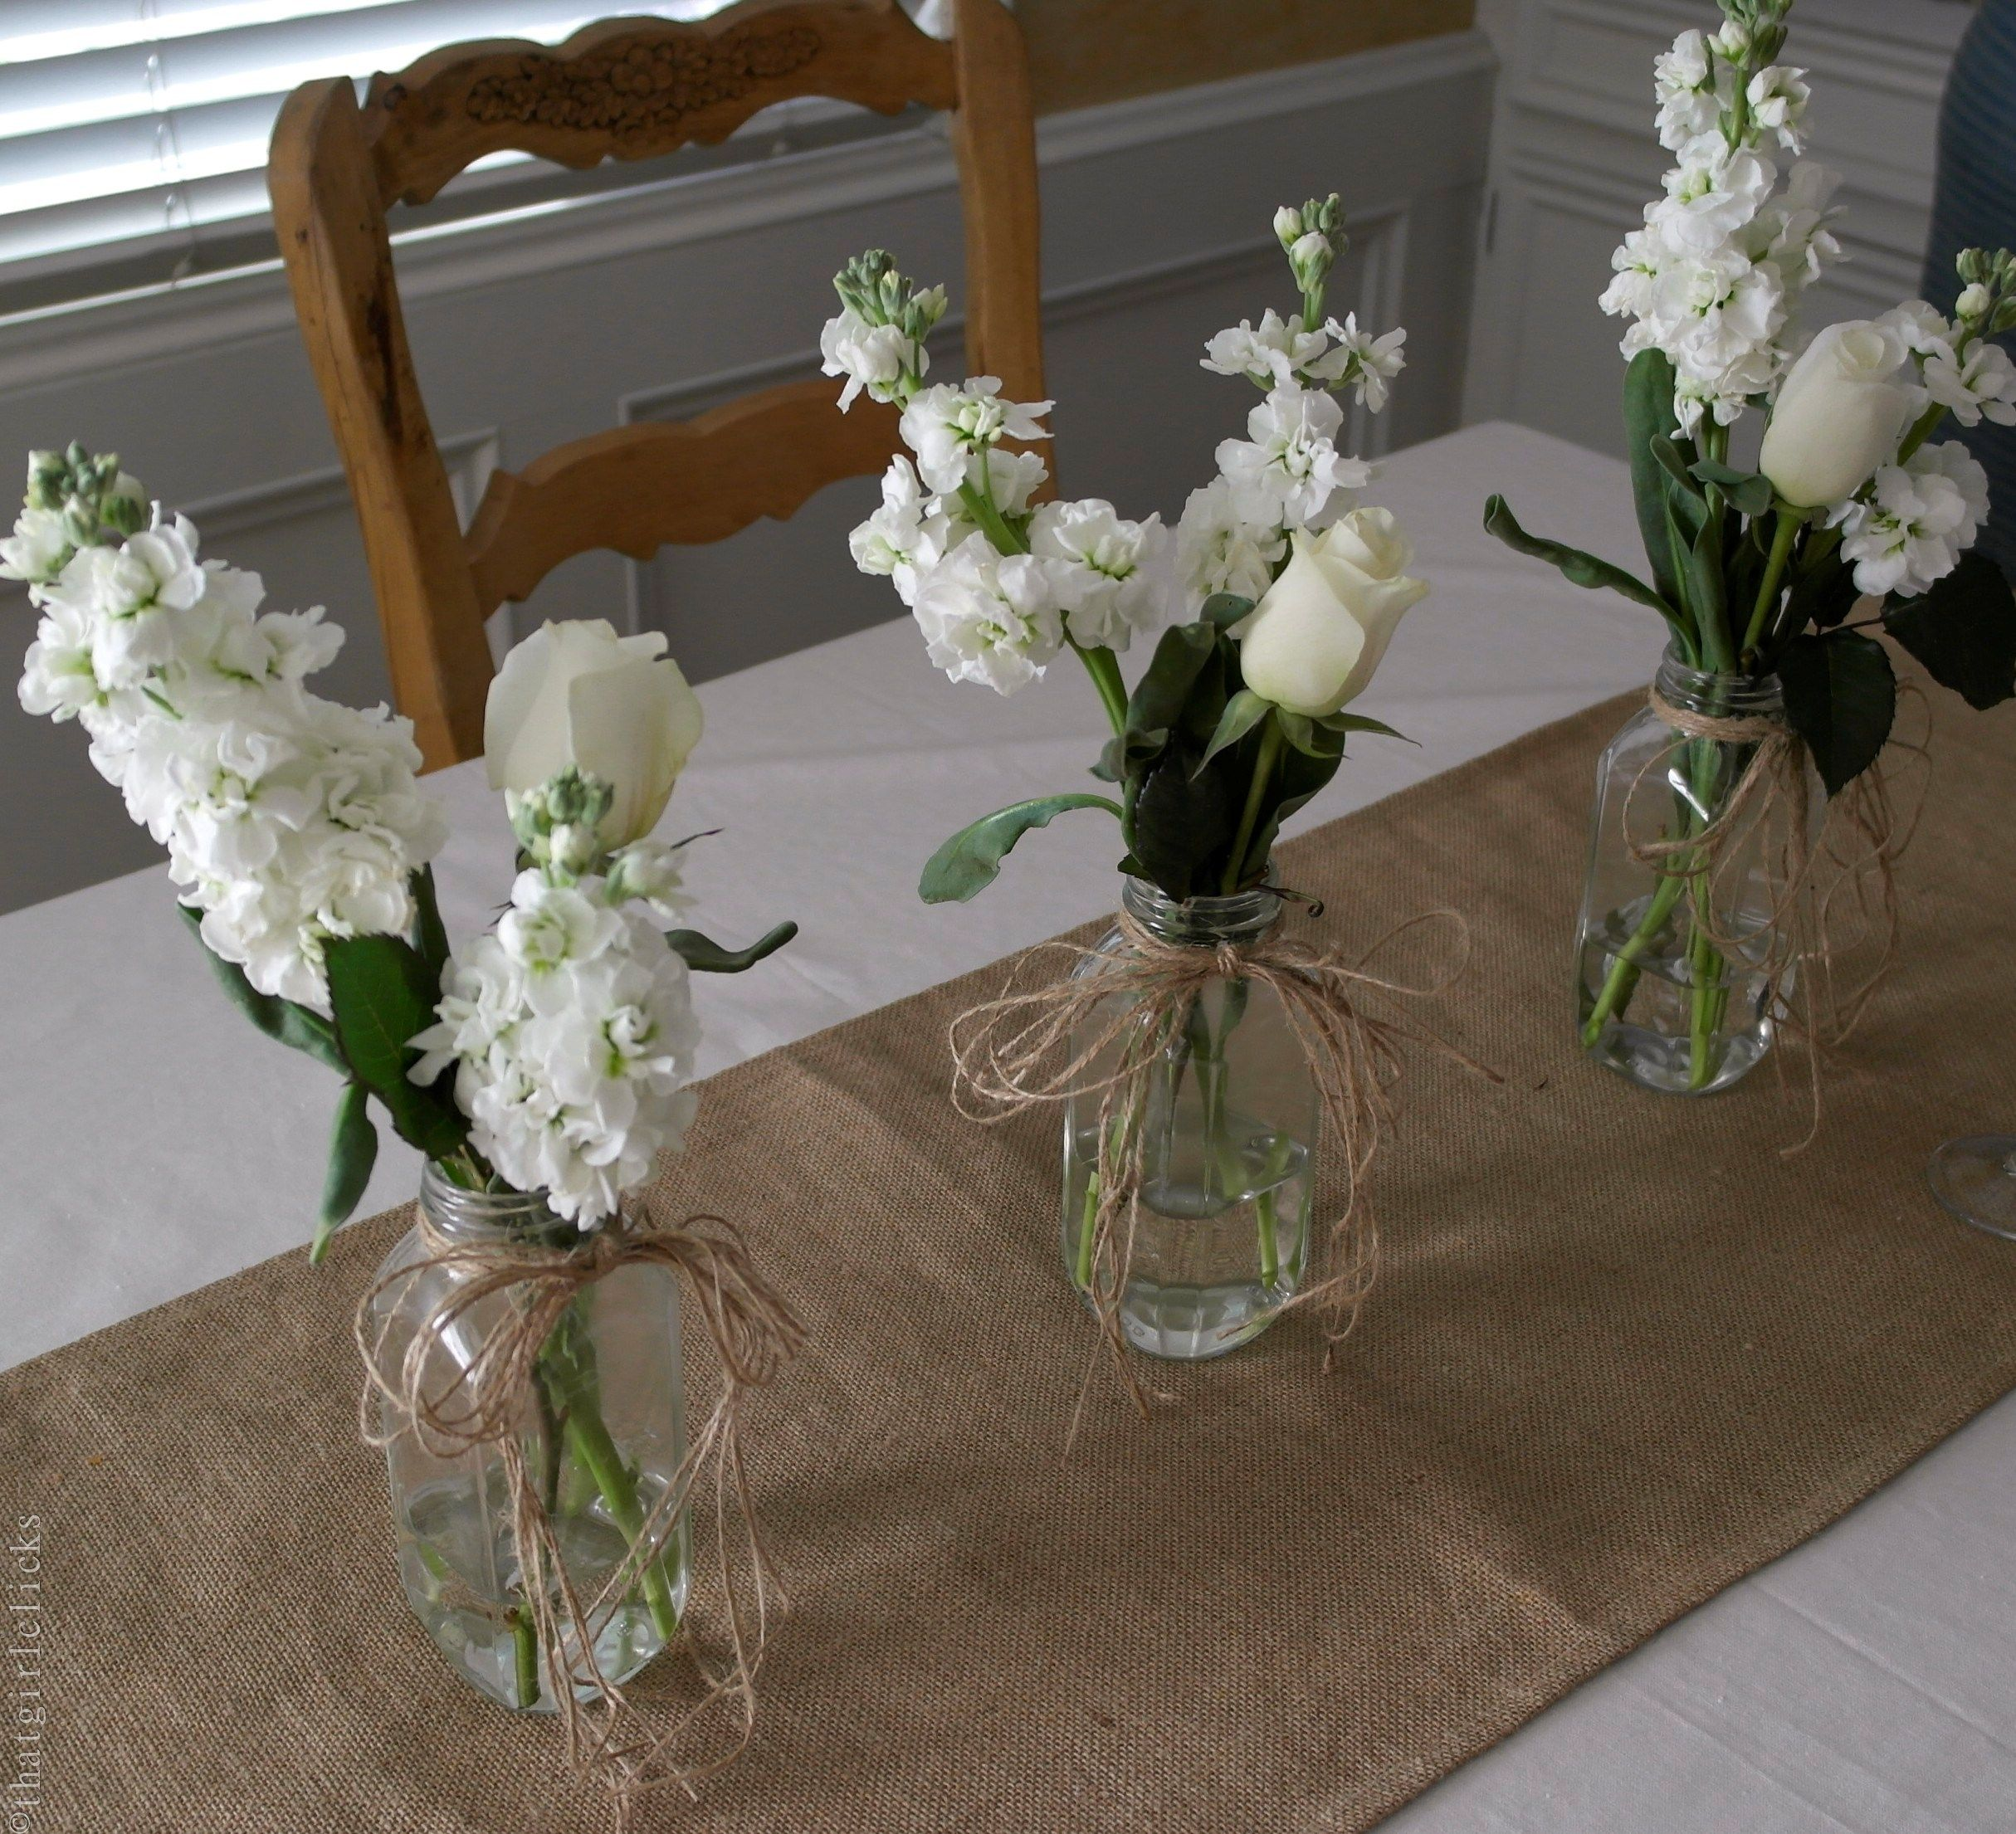 Kitchen Tea Table Decoration Ideas: Best 25+ Bridal Shower Tables Ideas On Pinterest